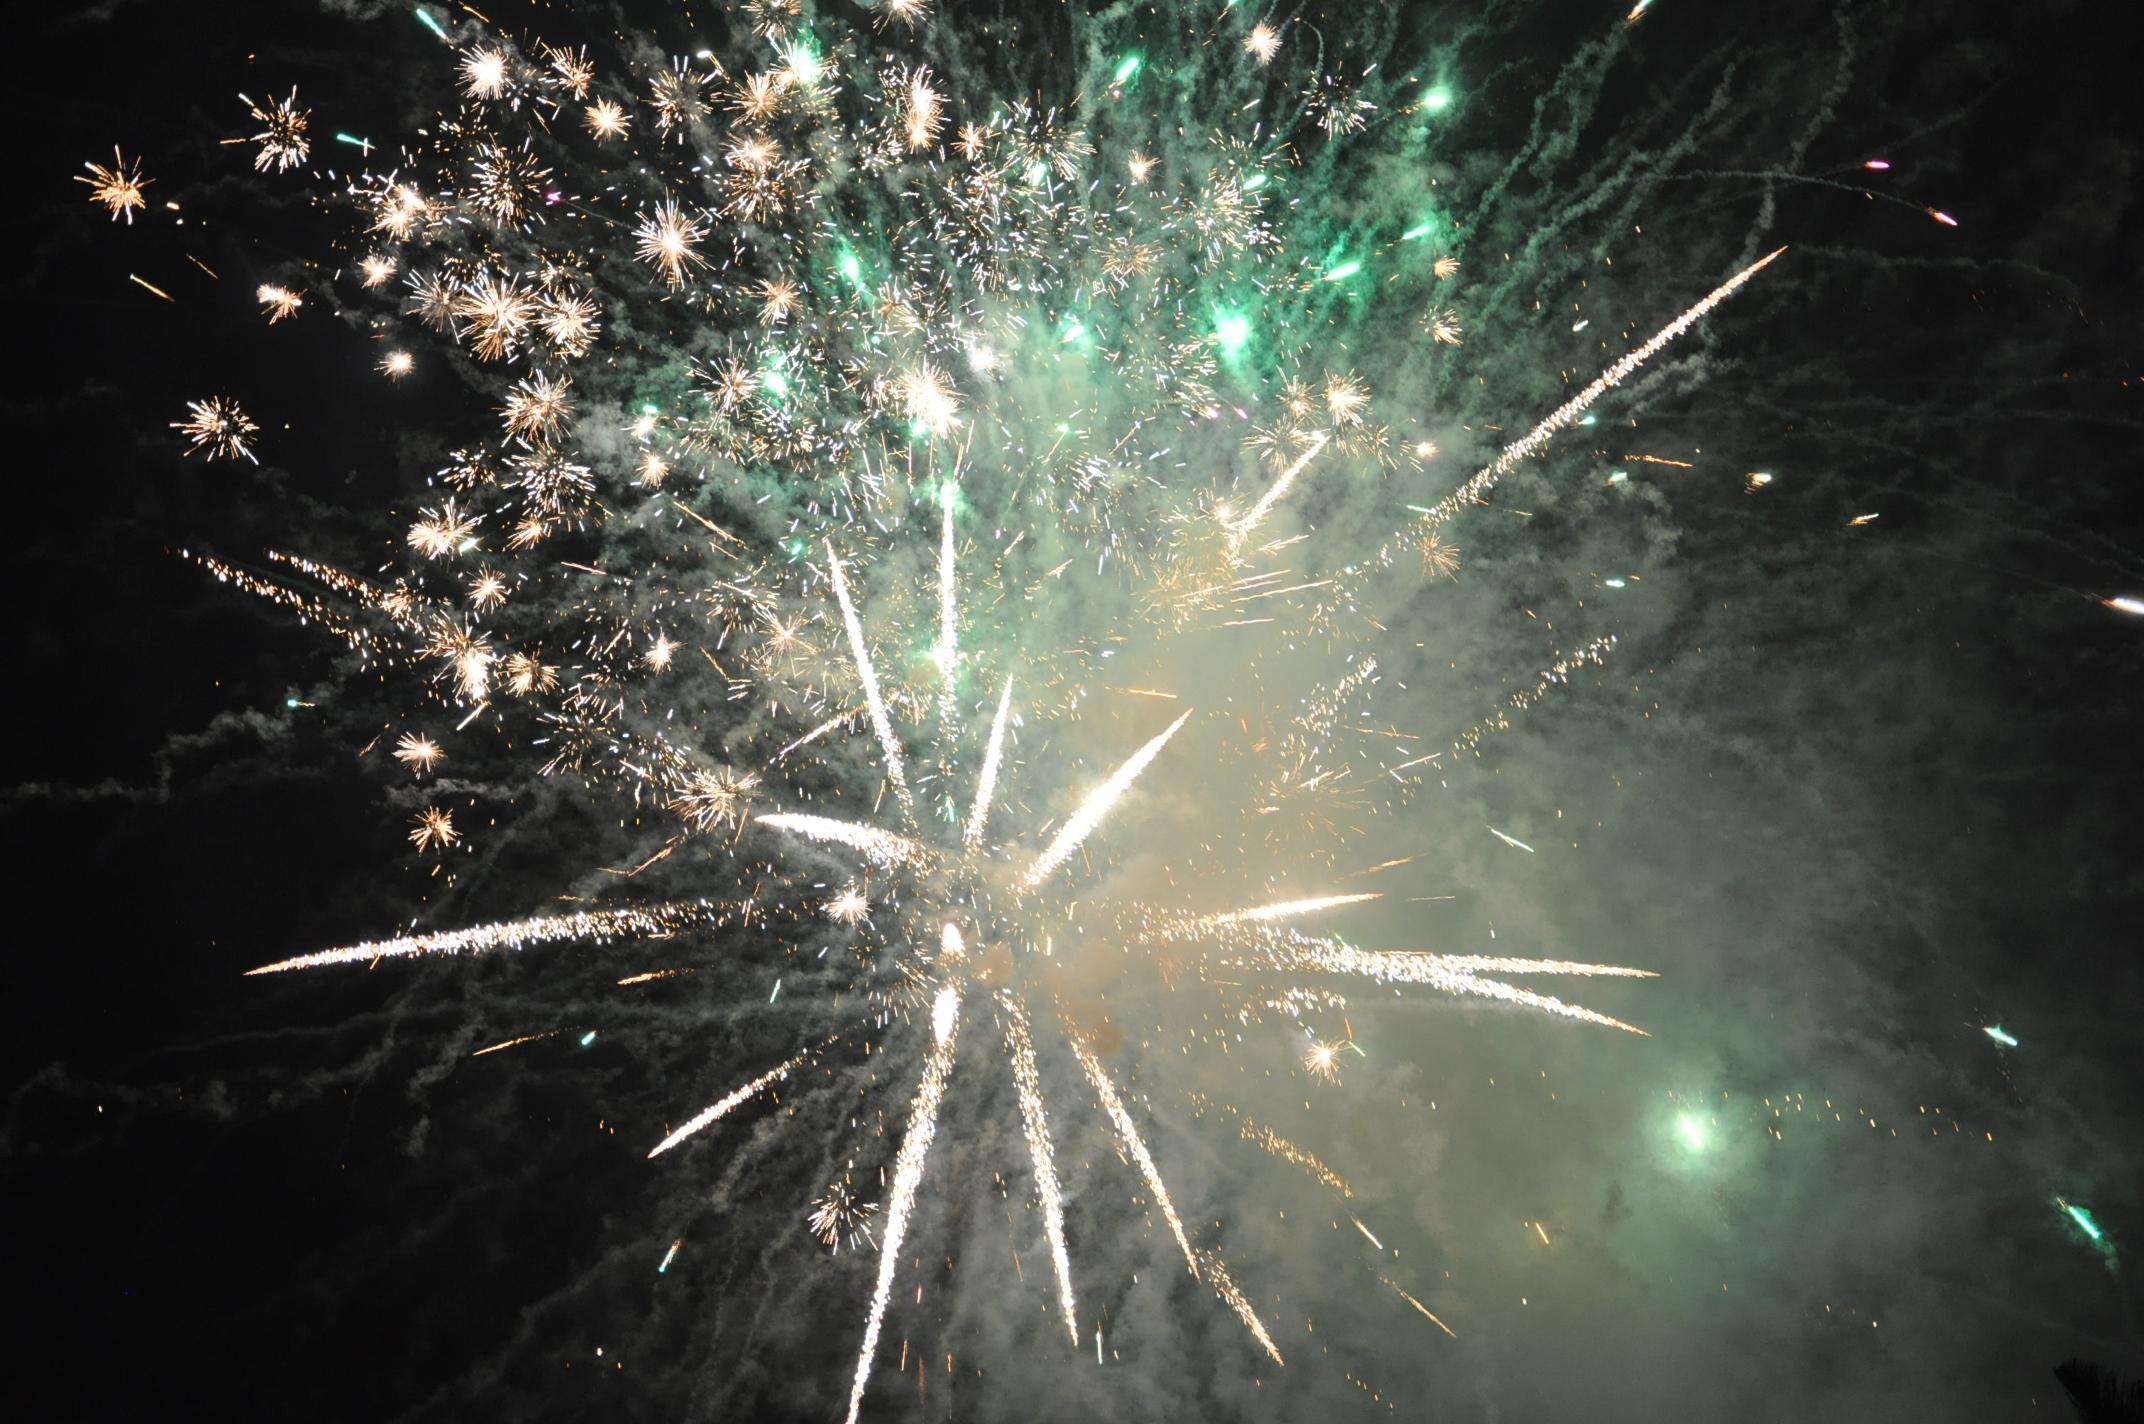 Lima Titik Perayaan 2015 Purwokerto Pemerintah Kabupaten Banyumas Alun Kab